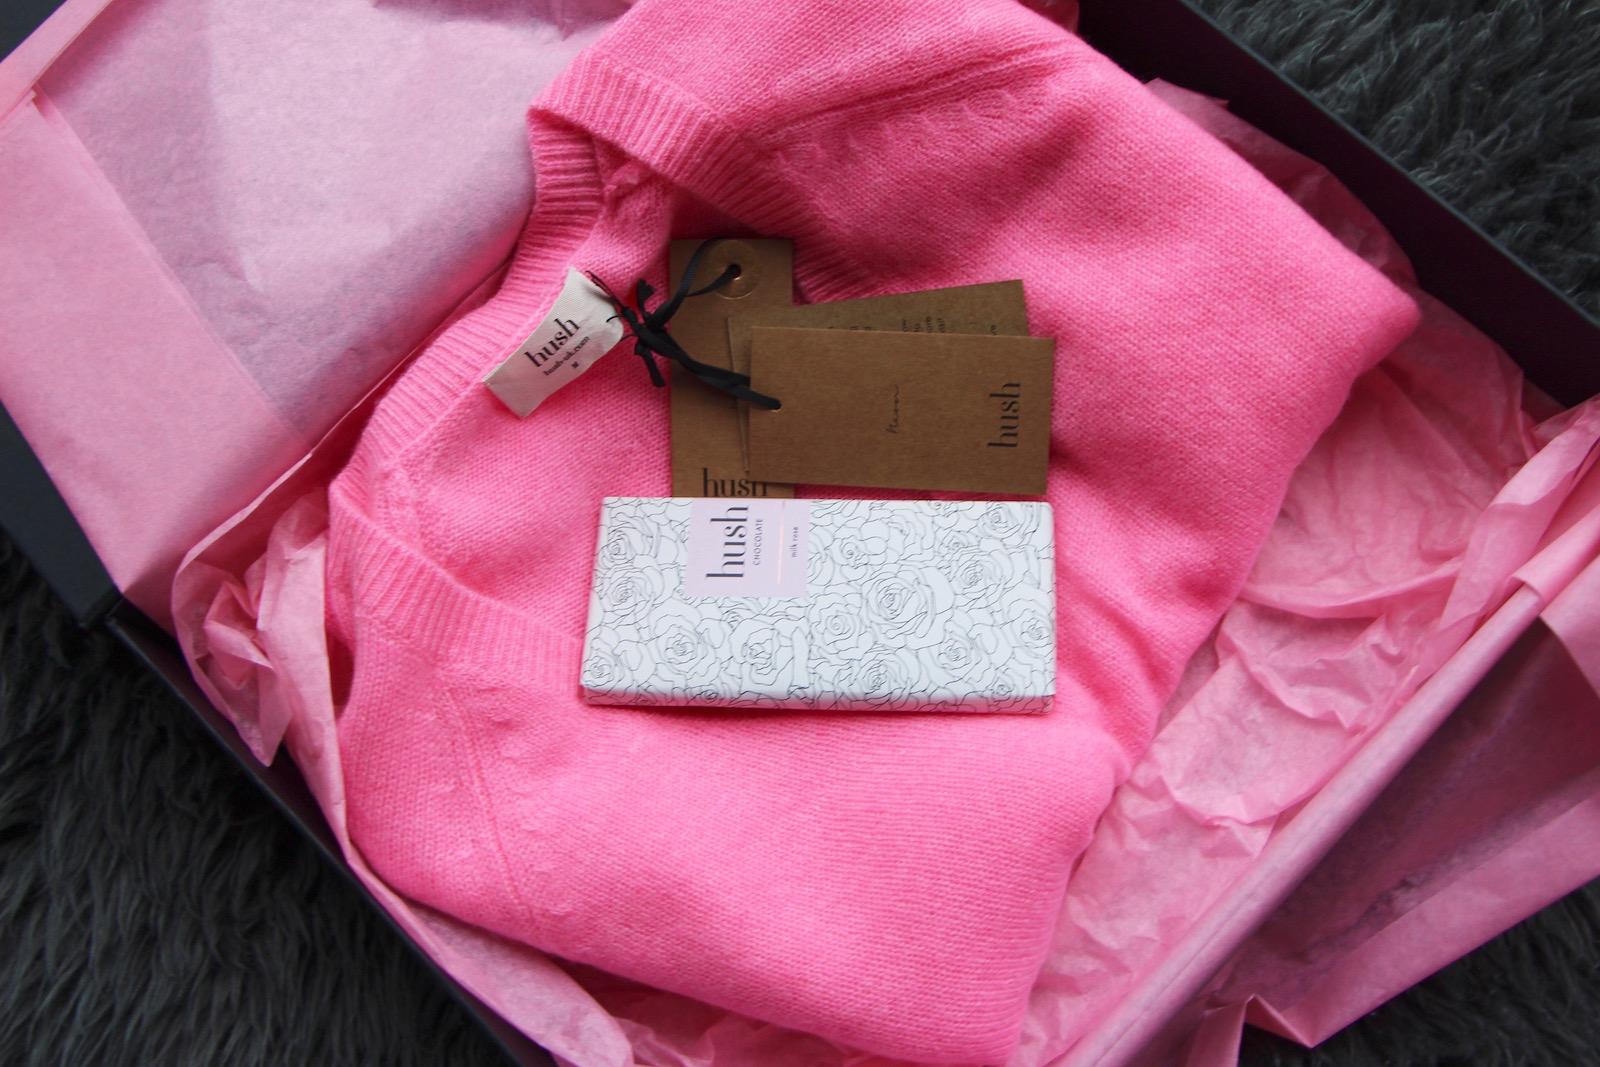 hush homewear gift set